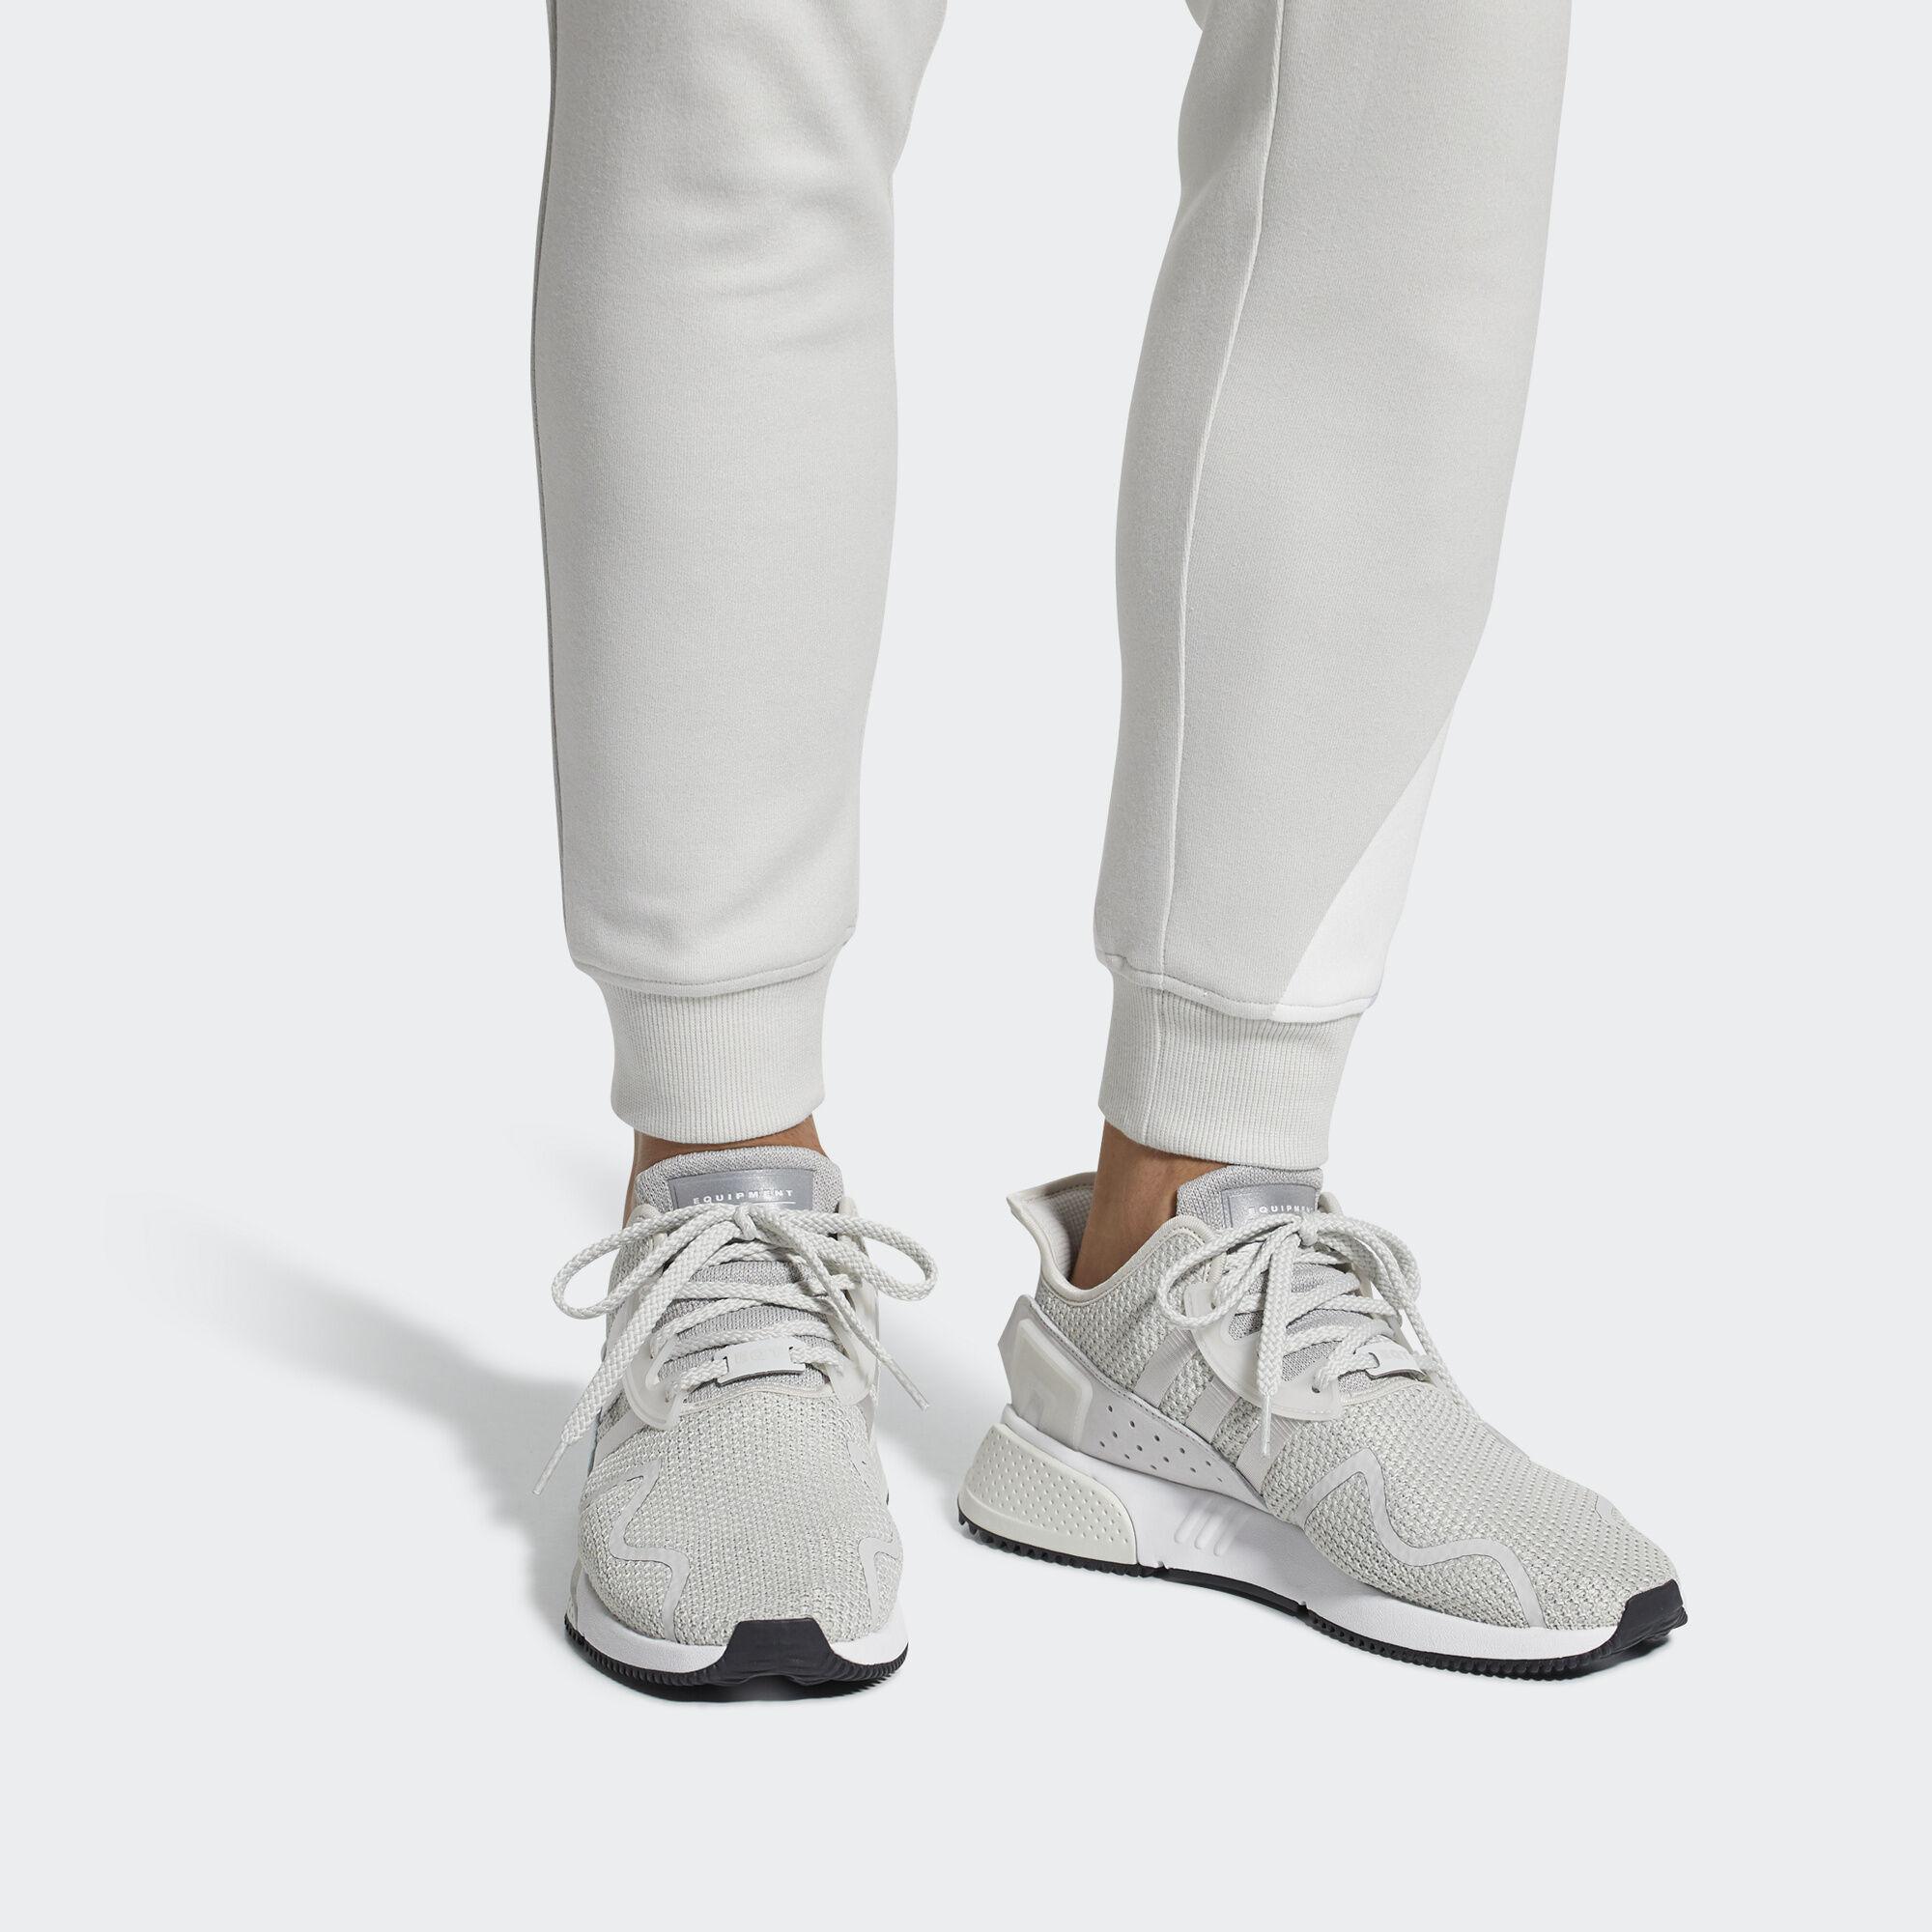 new concept ae5b2 886c7 adidas EQT Cushion ADV Schuh - schwarz  adidas Deutschland